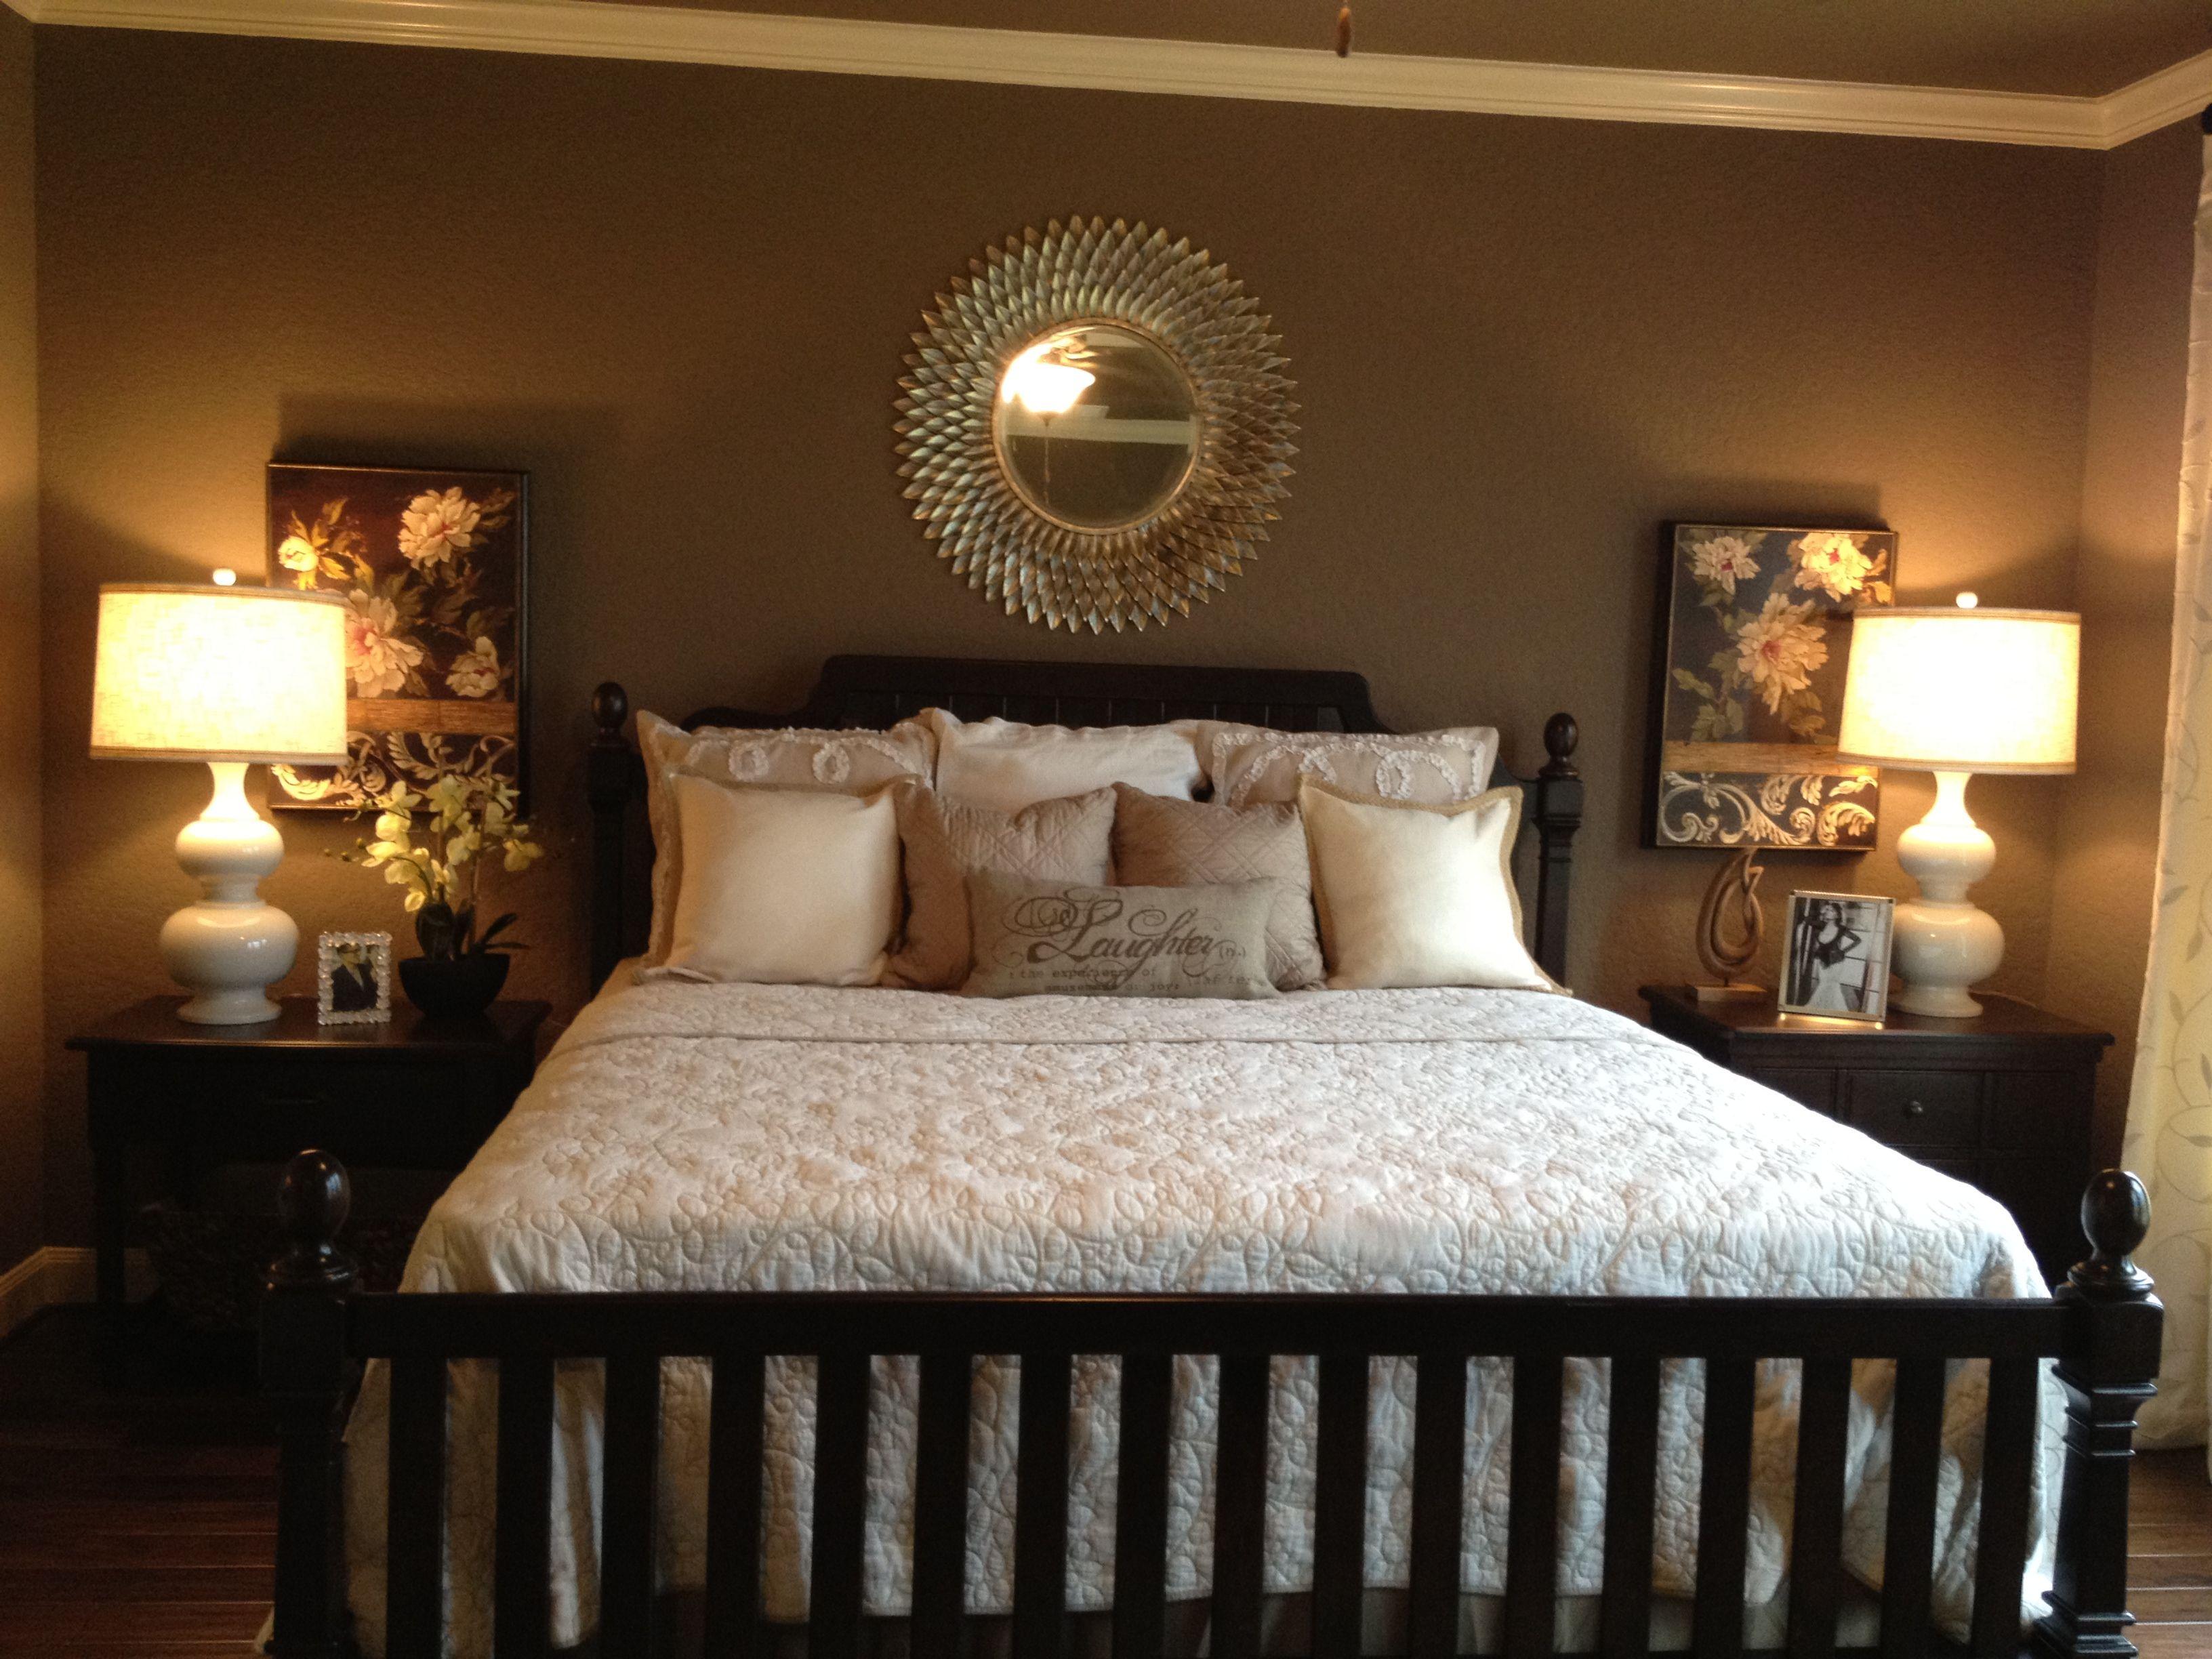 Master Bedroom | Bedroom decor, Pinterest home decor ideas ...